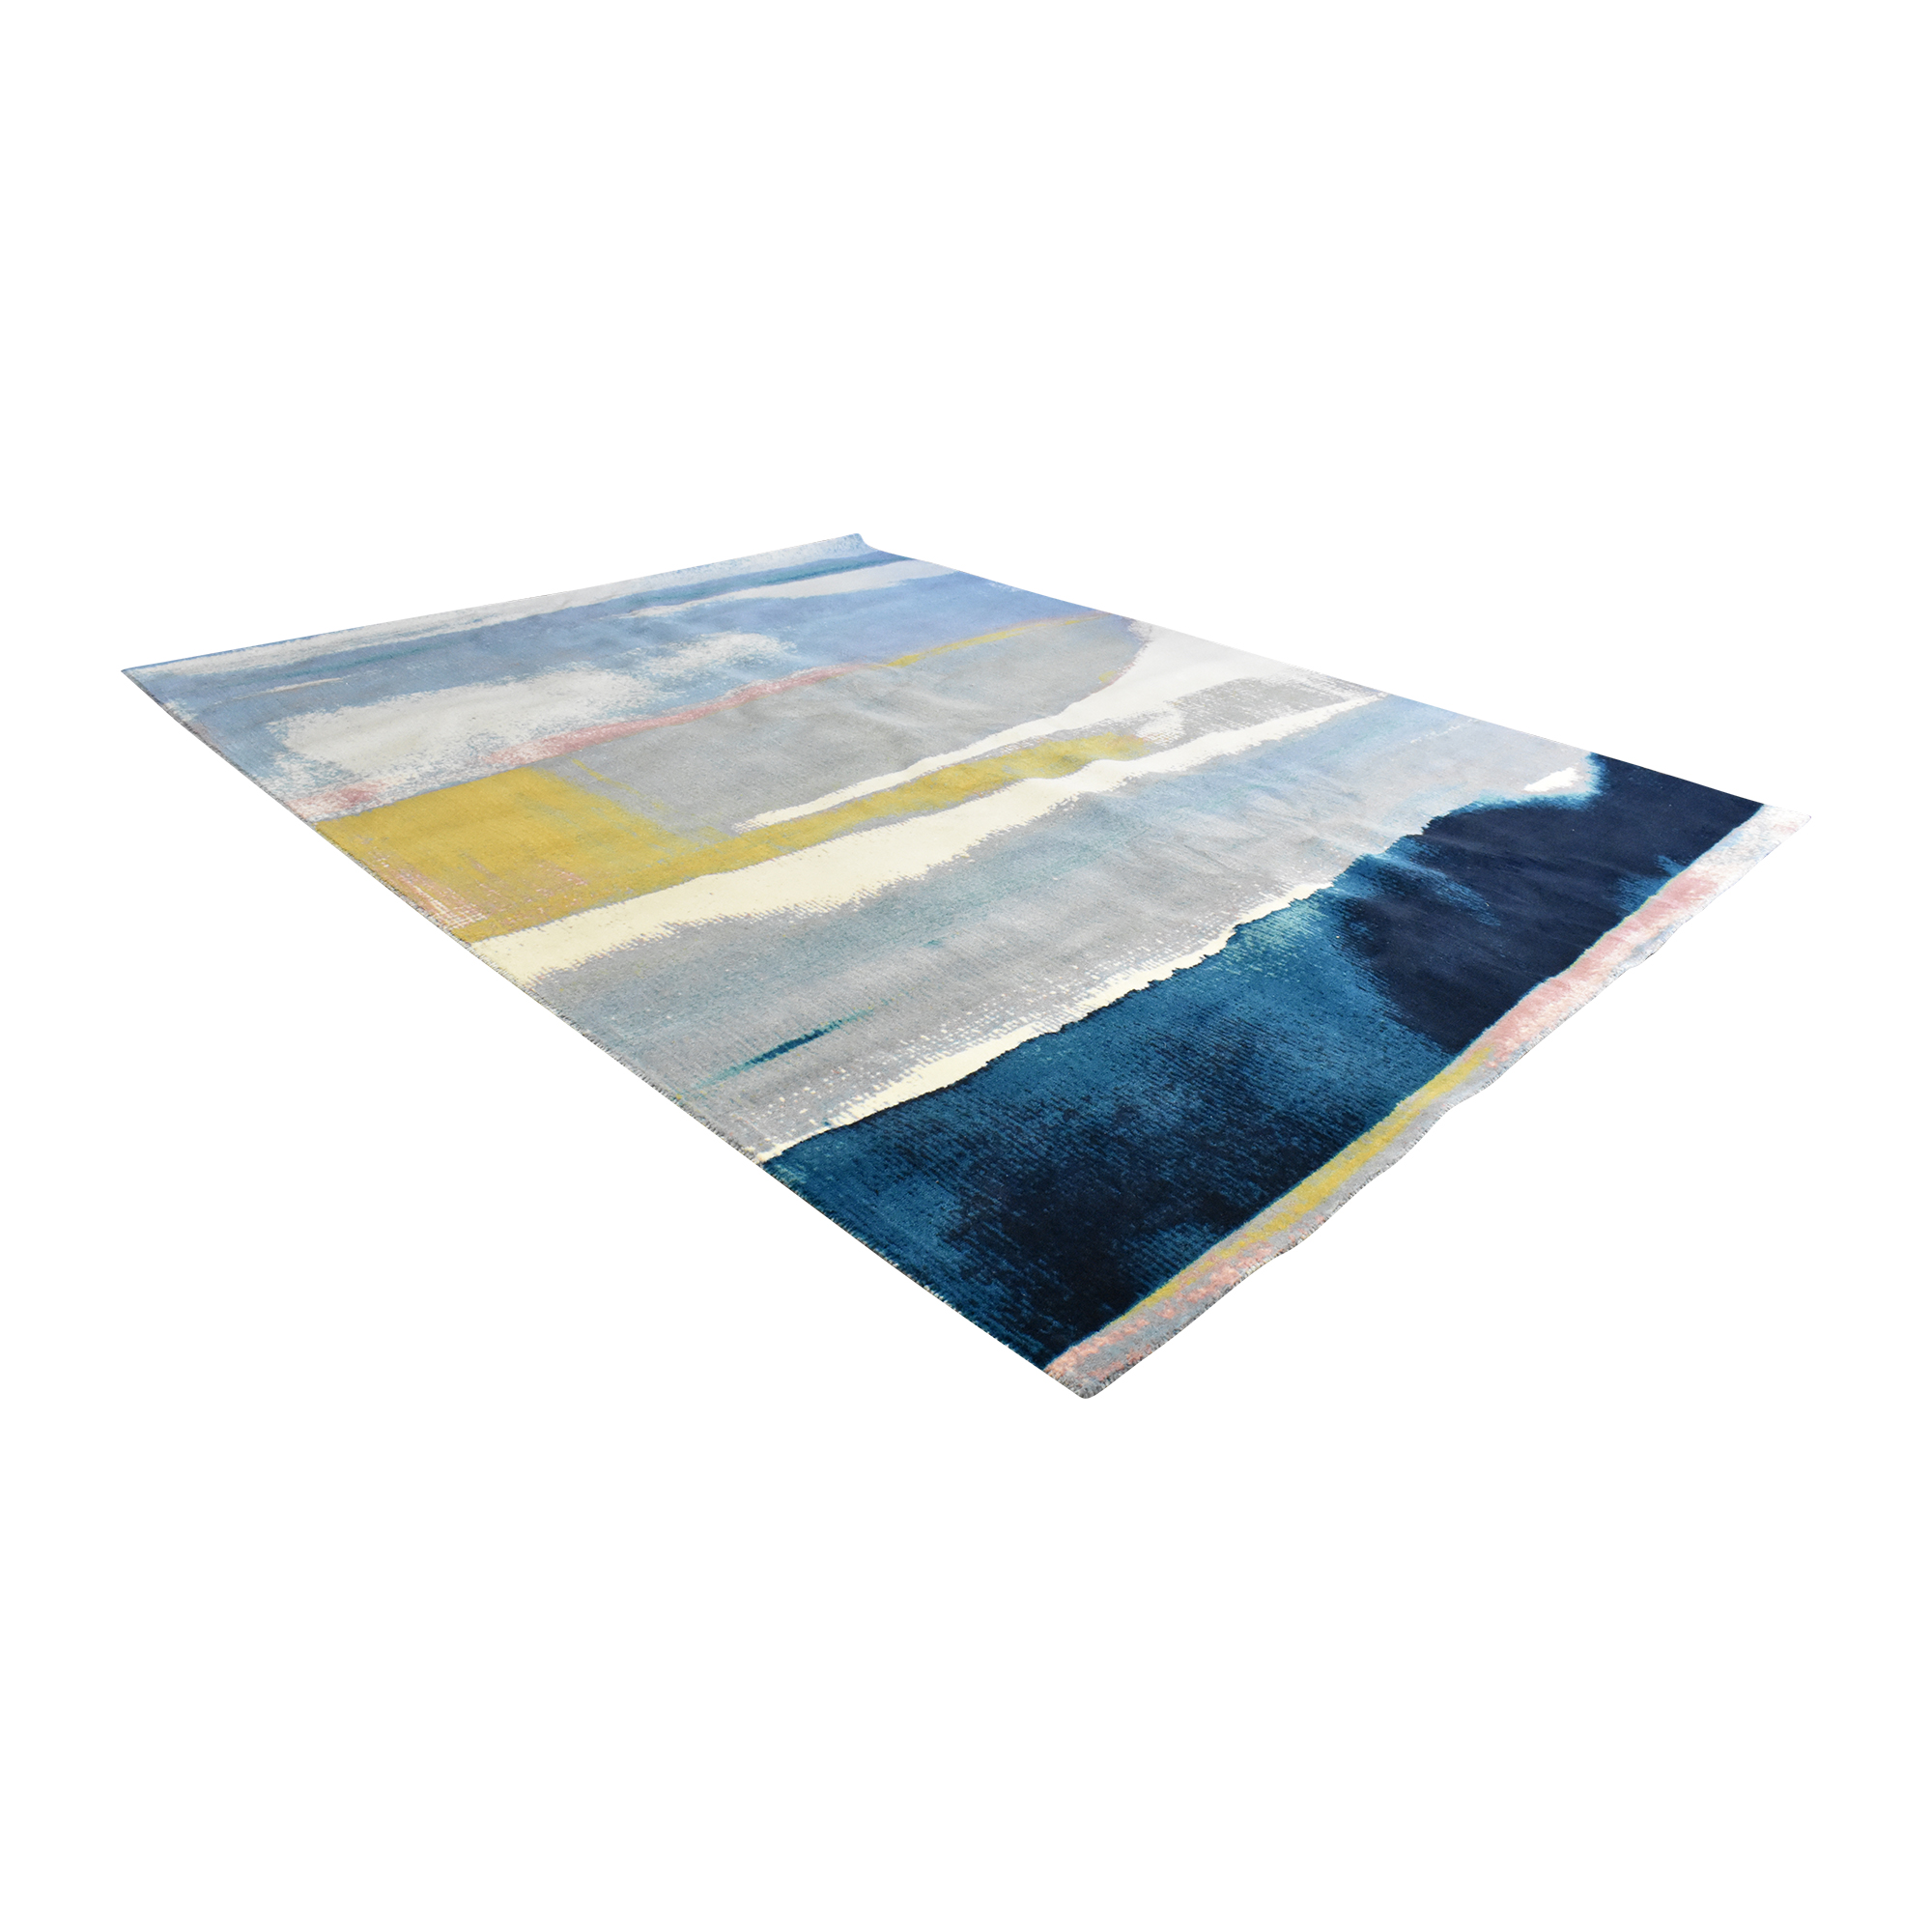 West Elm West Elm Sun-Kissed Landscape Rug dimensions